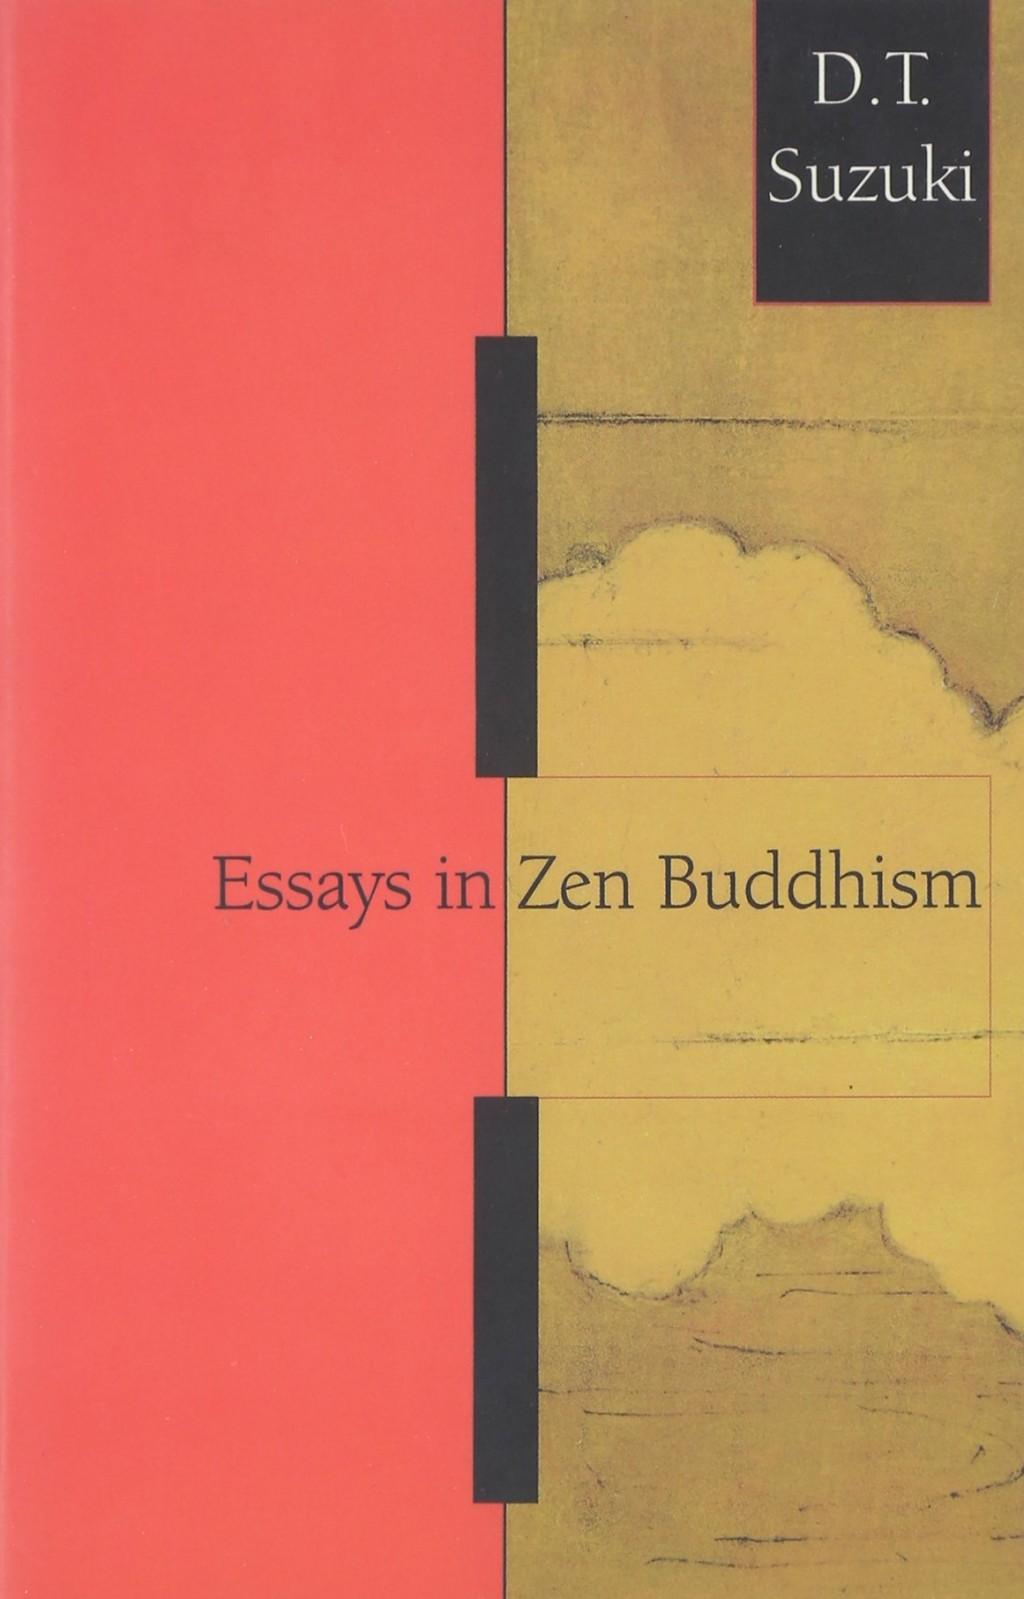 003 71cccelhvrl Essay Example Essays First Stunning Series In Zen Buddhism Emerson's Value Large